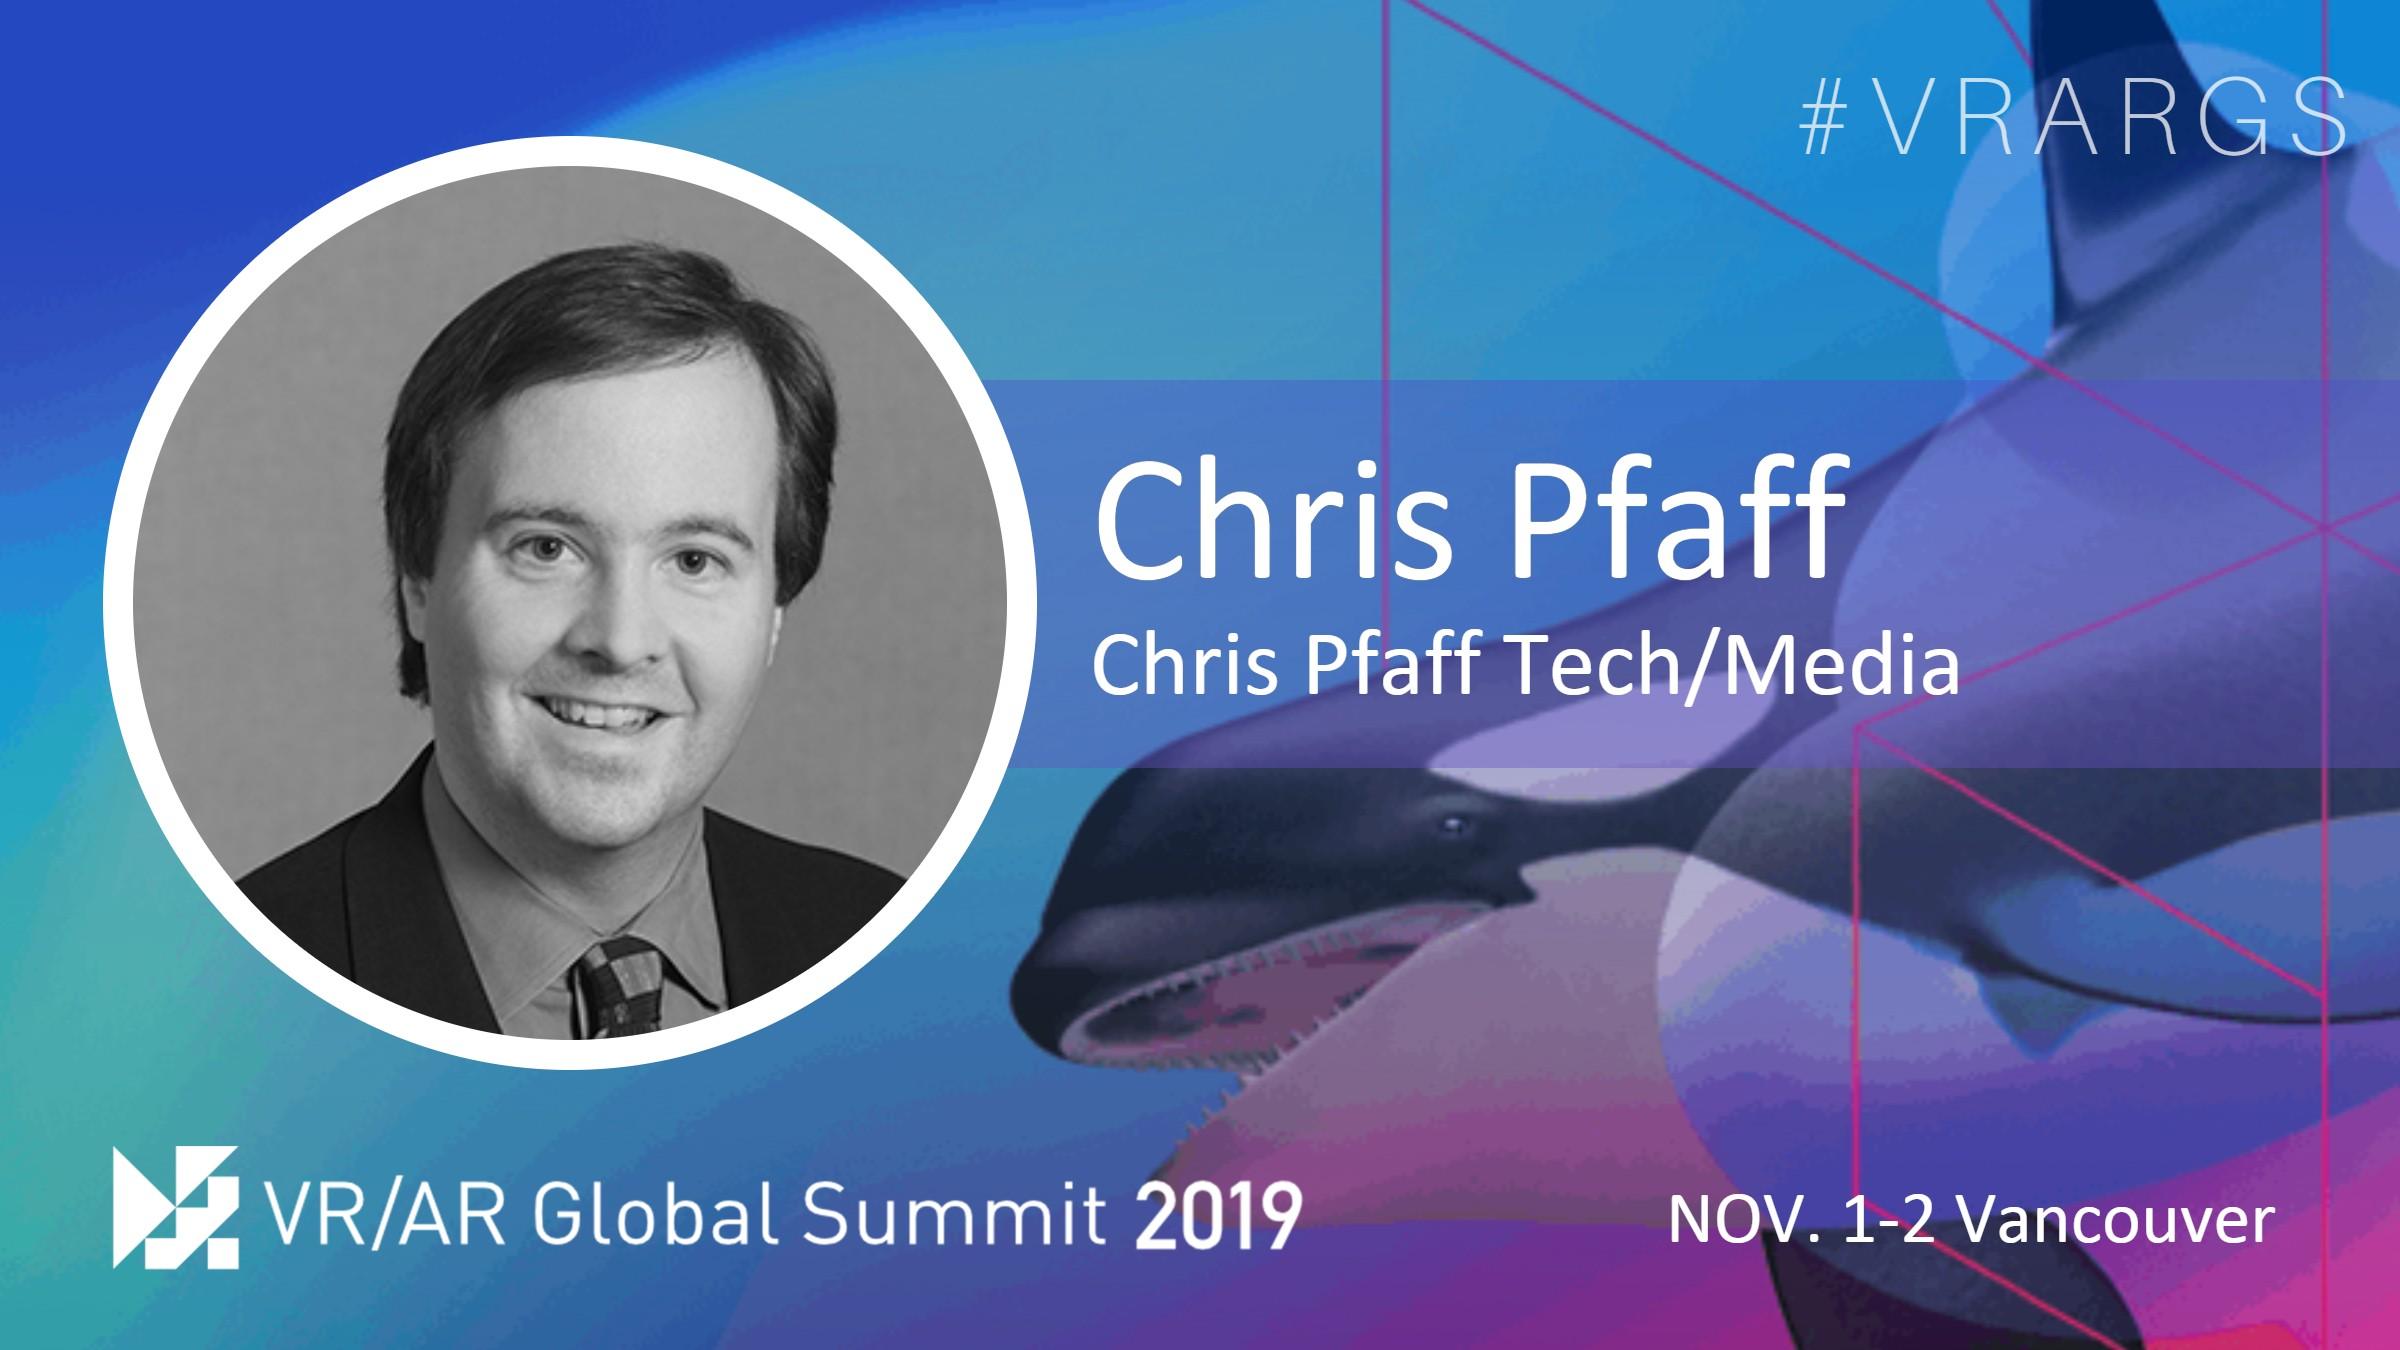 HighRes-Chris-Pfaff-Tech-Media-XR-VRARGS-VRAR-Global-Summit-Spatial-Computing-Vancouver.jpg